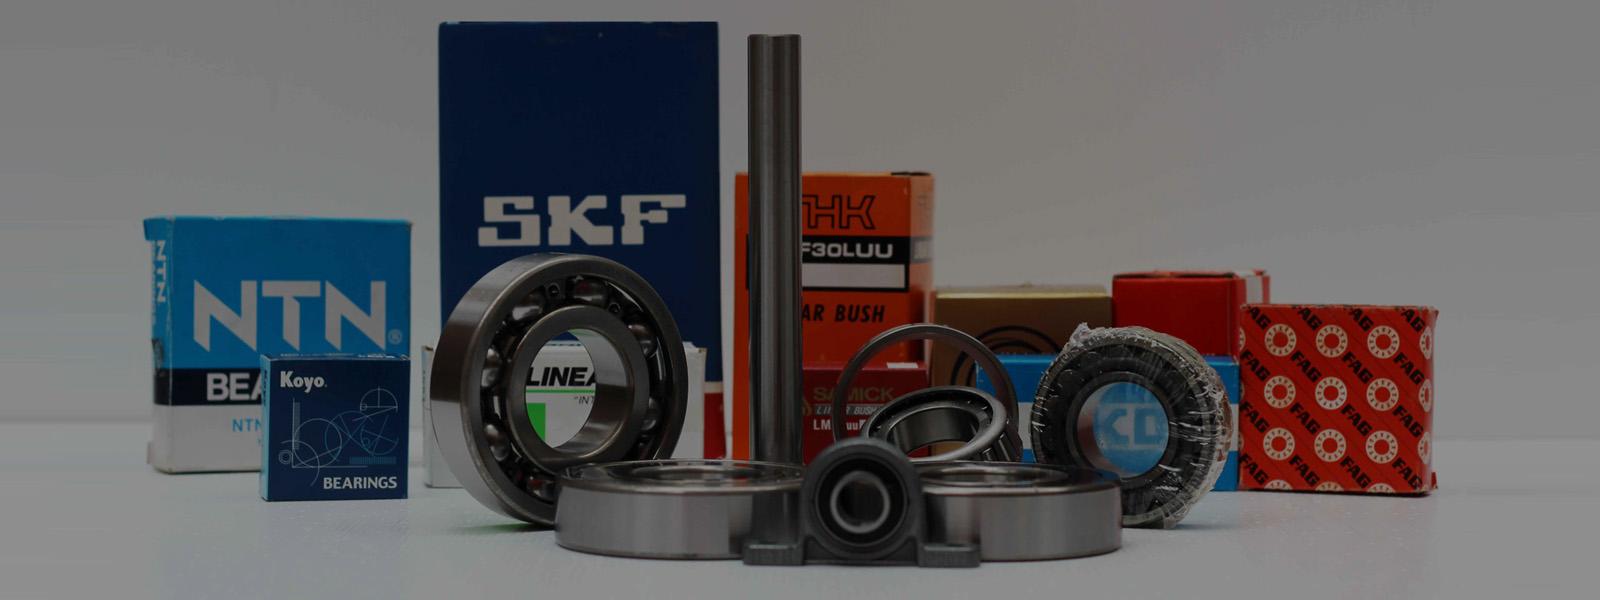 Kualitas & kelengkapan produk bearing kami sudah dikenal baik sejak 1997